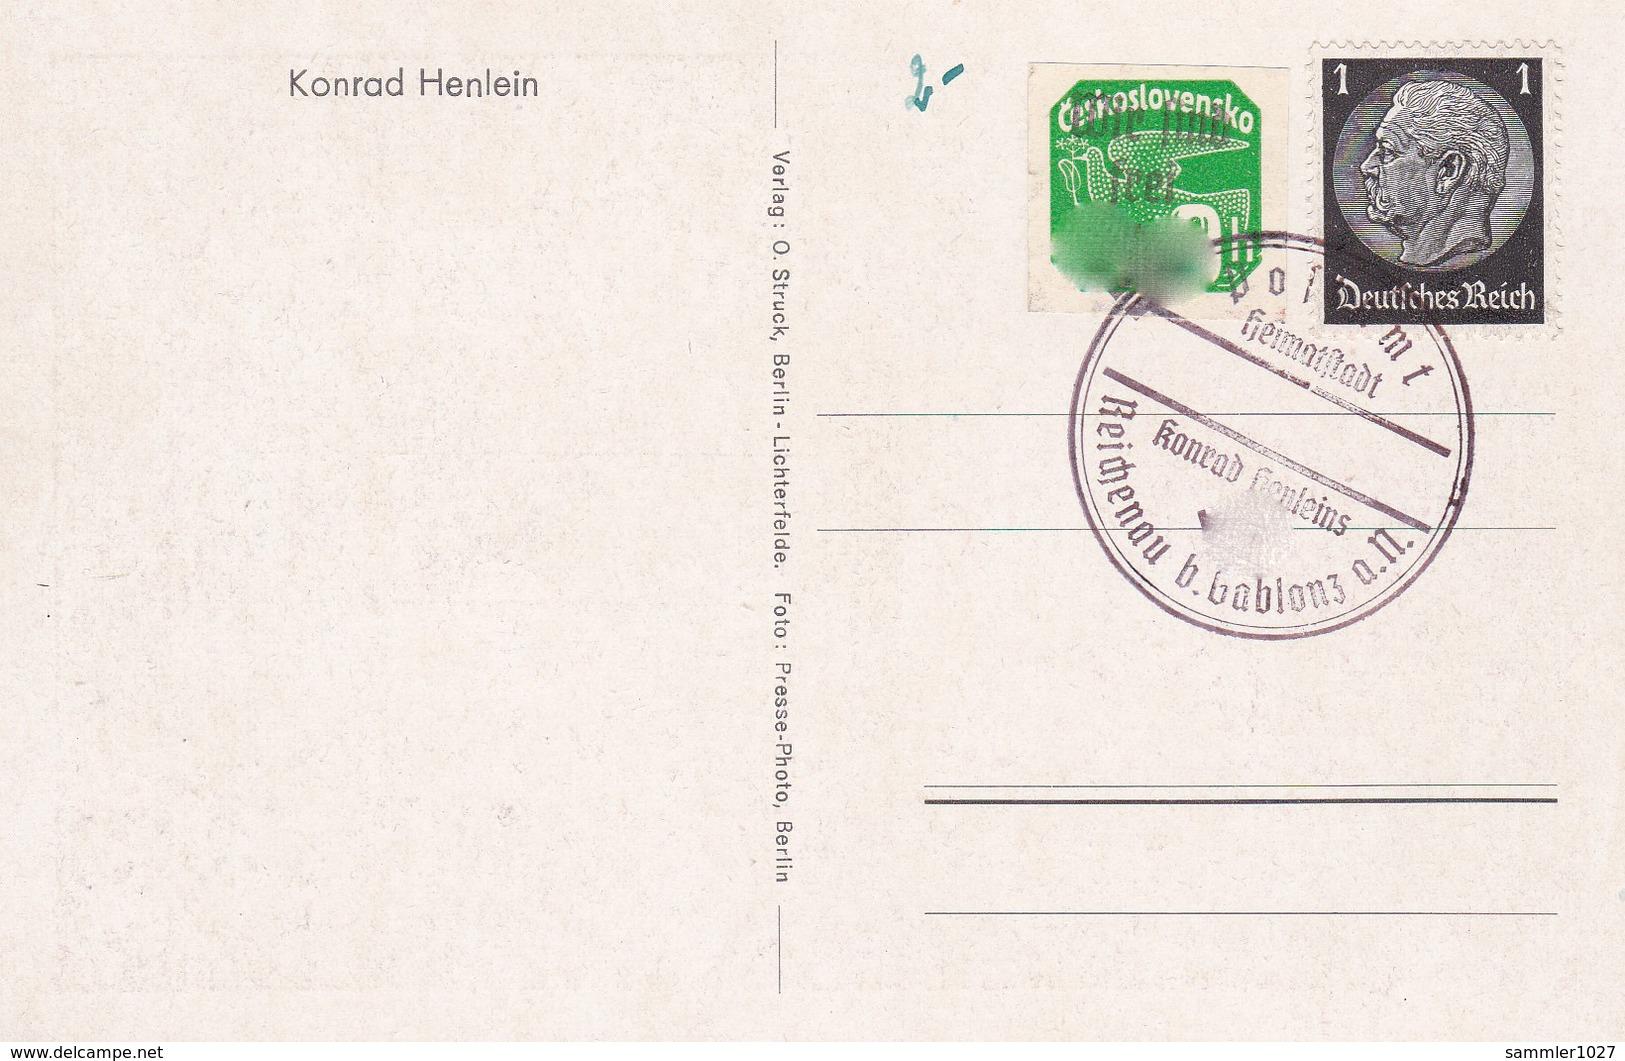 Böhmen Und Mähren Sammlerkarte Reichenau Sudeten 1938 - Bohemia & Moravia